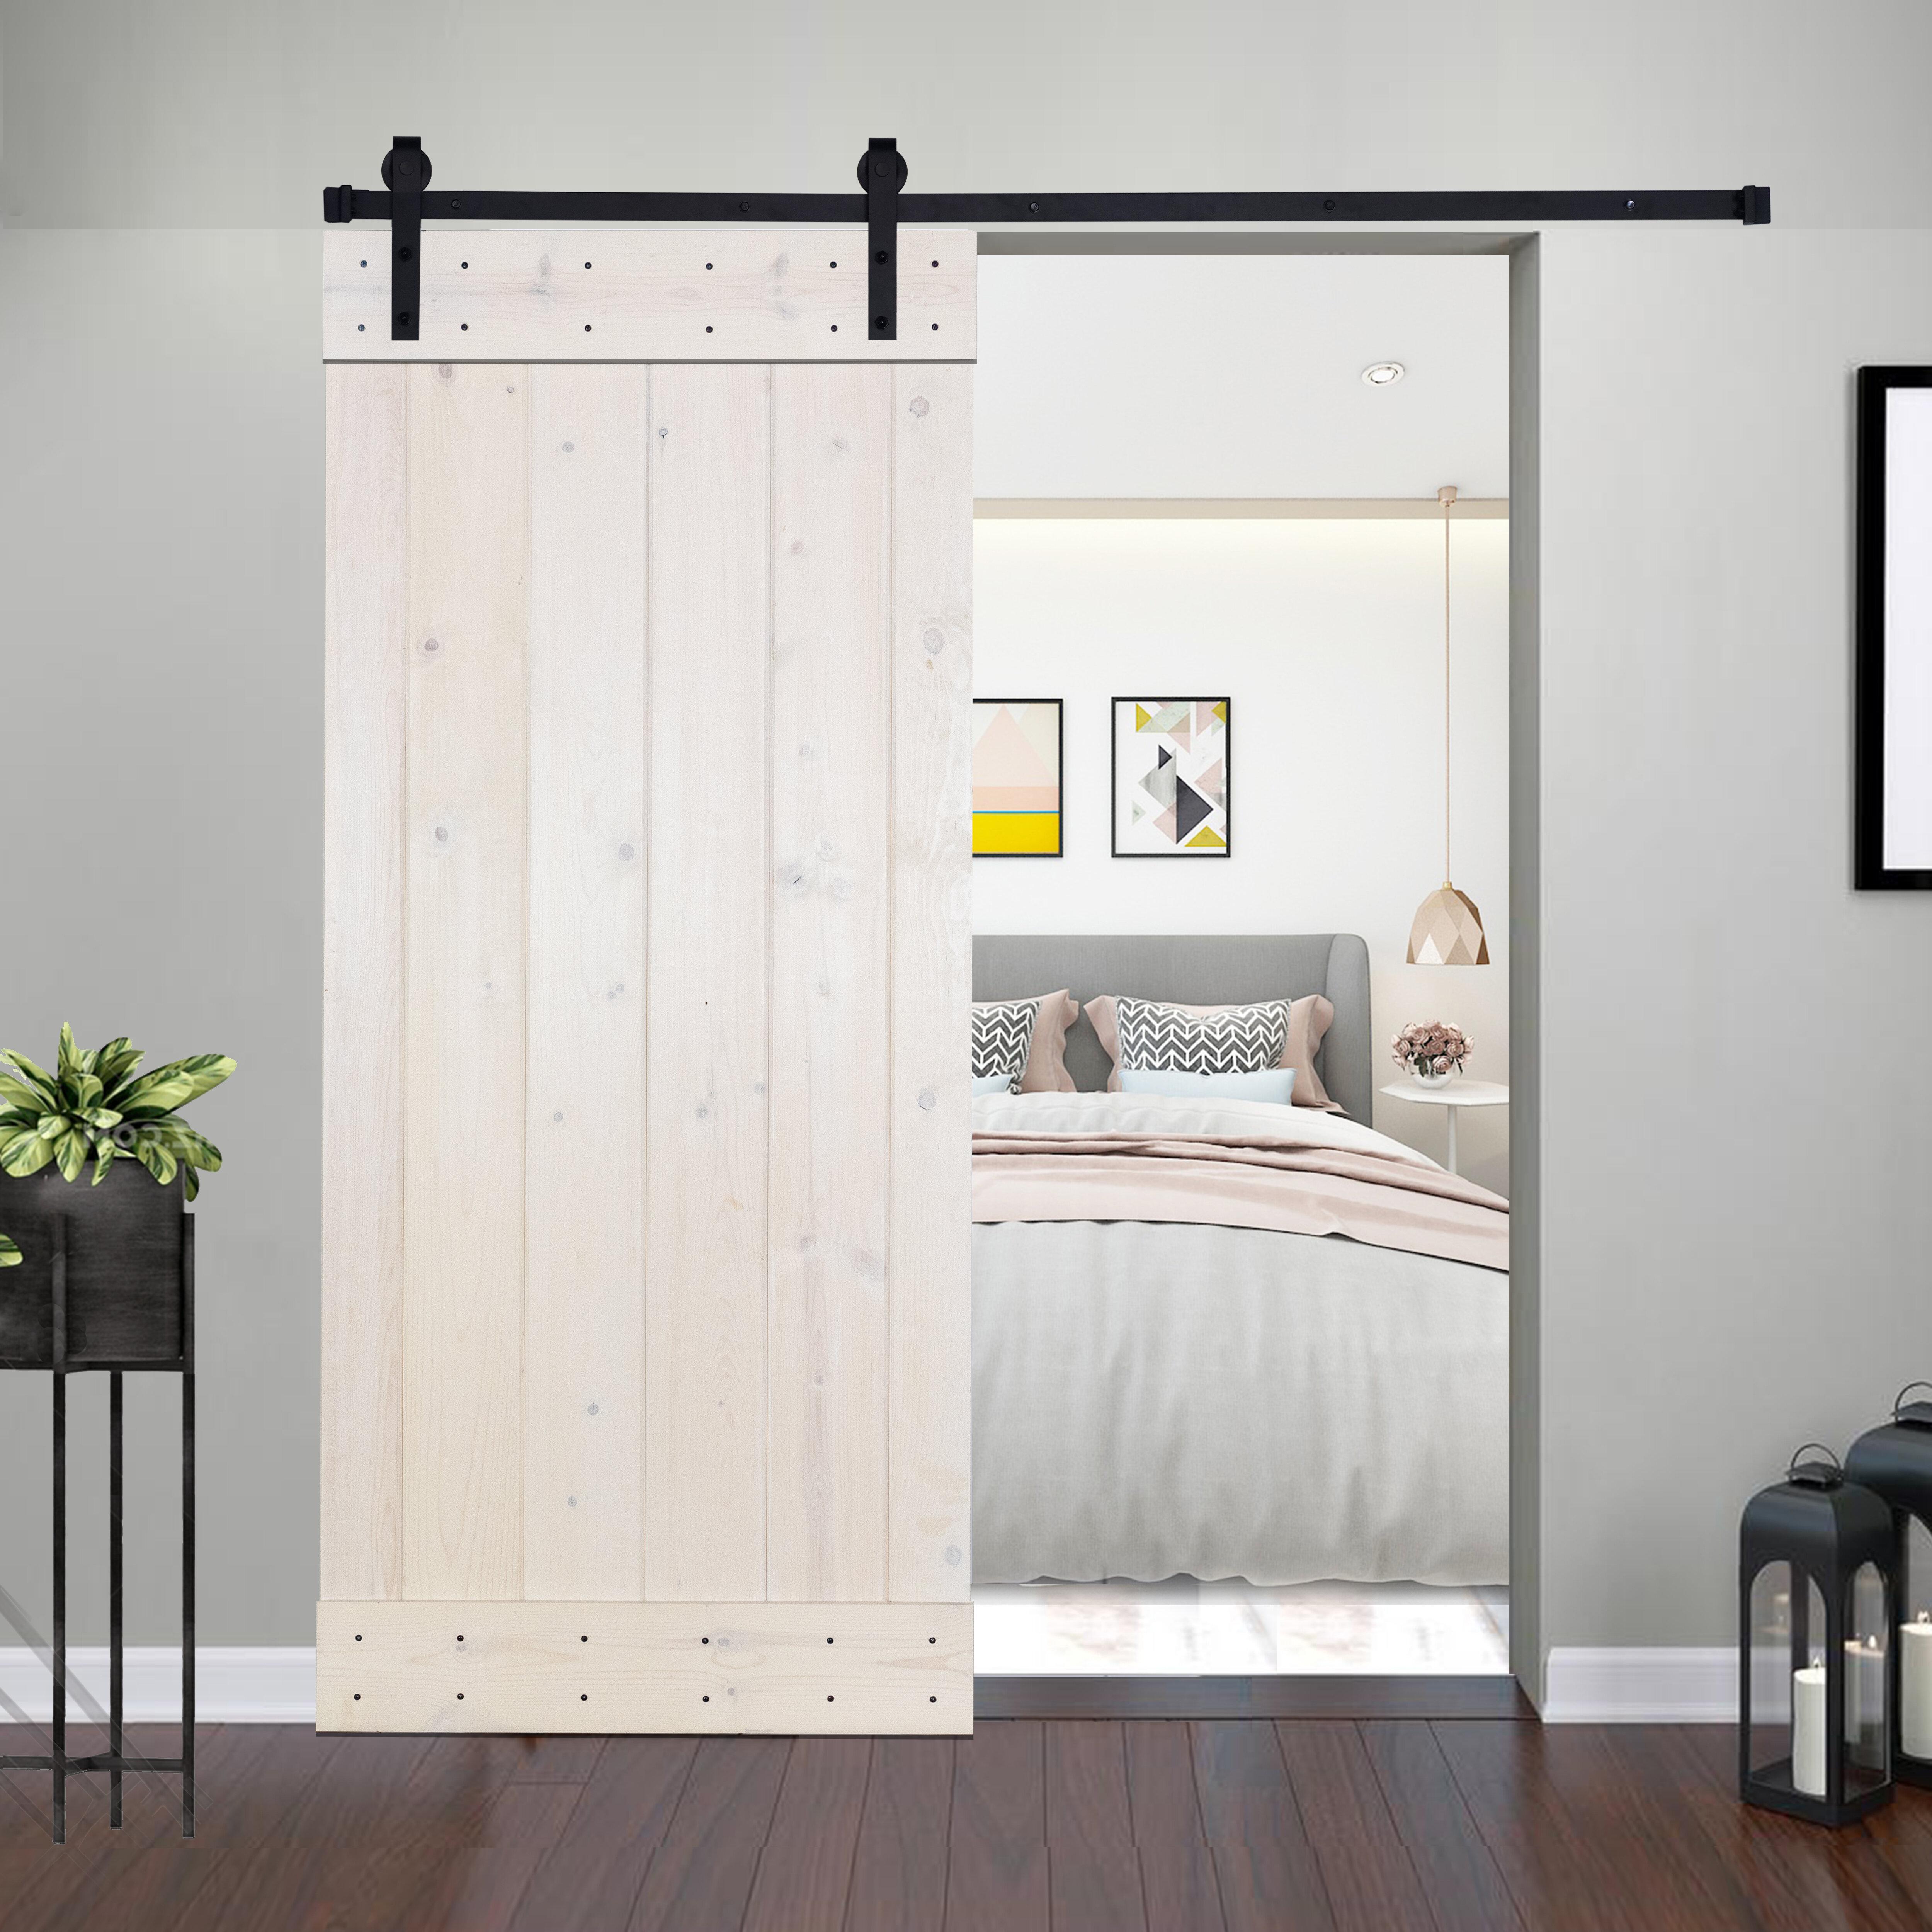 Akicon Paneled Wood Barn Door With Installation Hardware Kit Reviews Wayfair